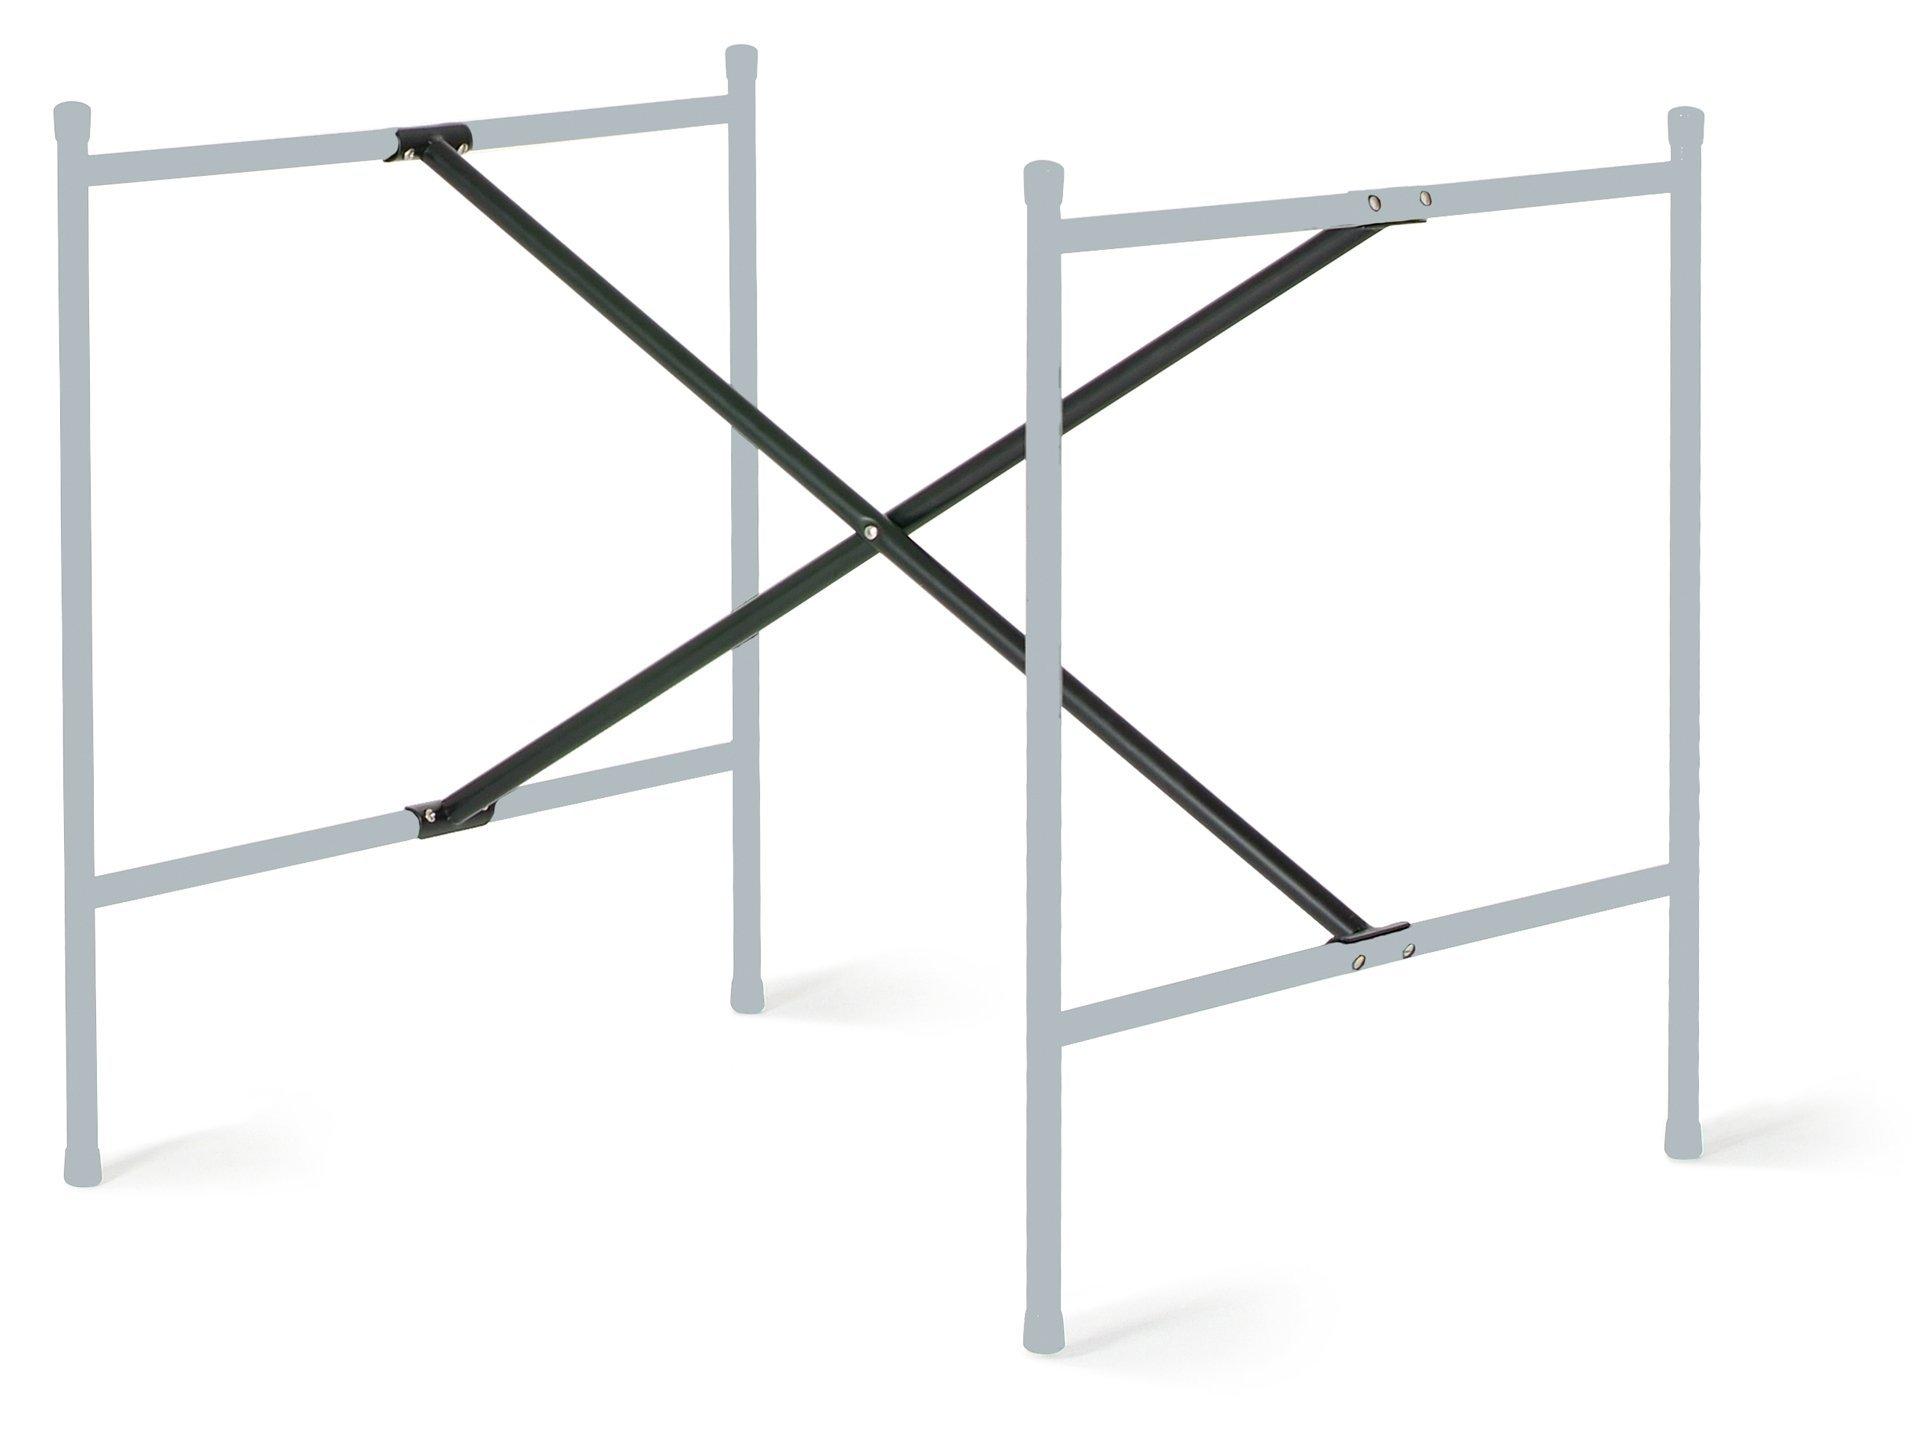 tischgestell e2 kreuzstreben online kaufen modulor. Black Bedroom Furniture Sets. Home Design Ideas